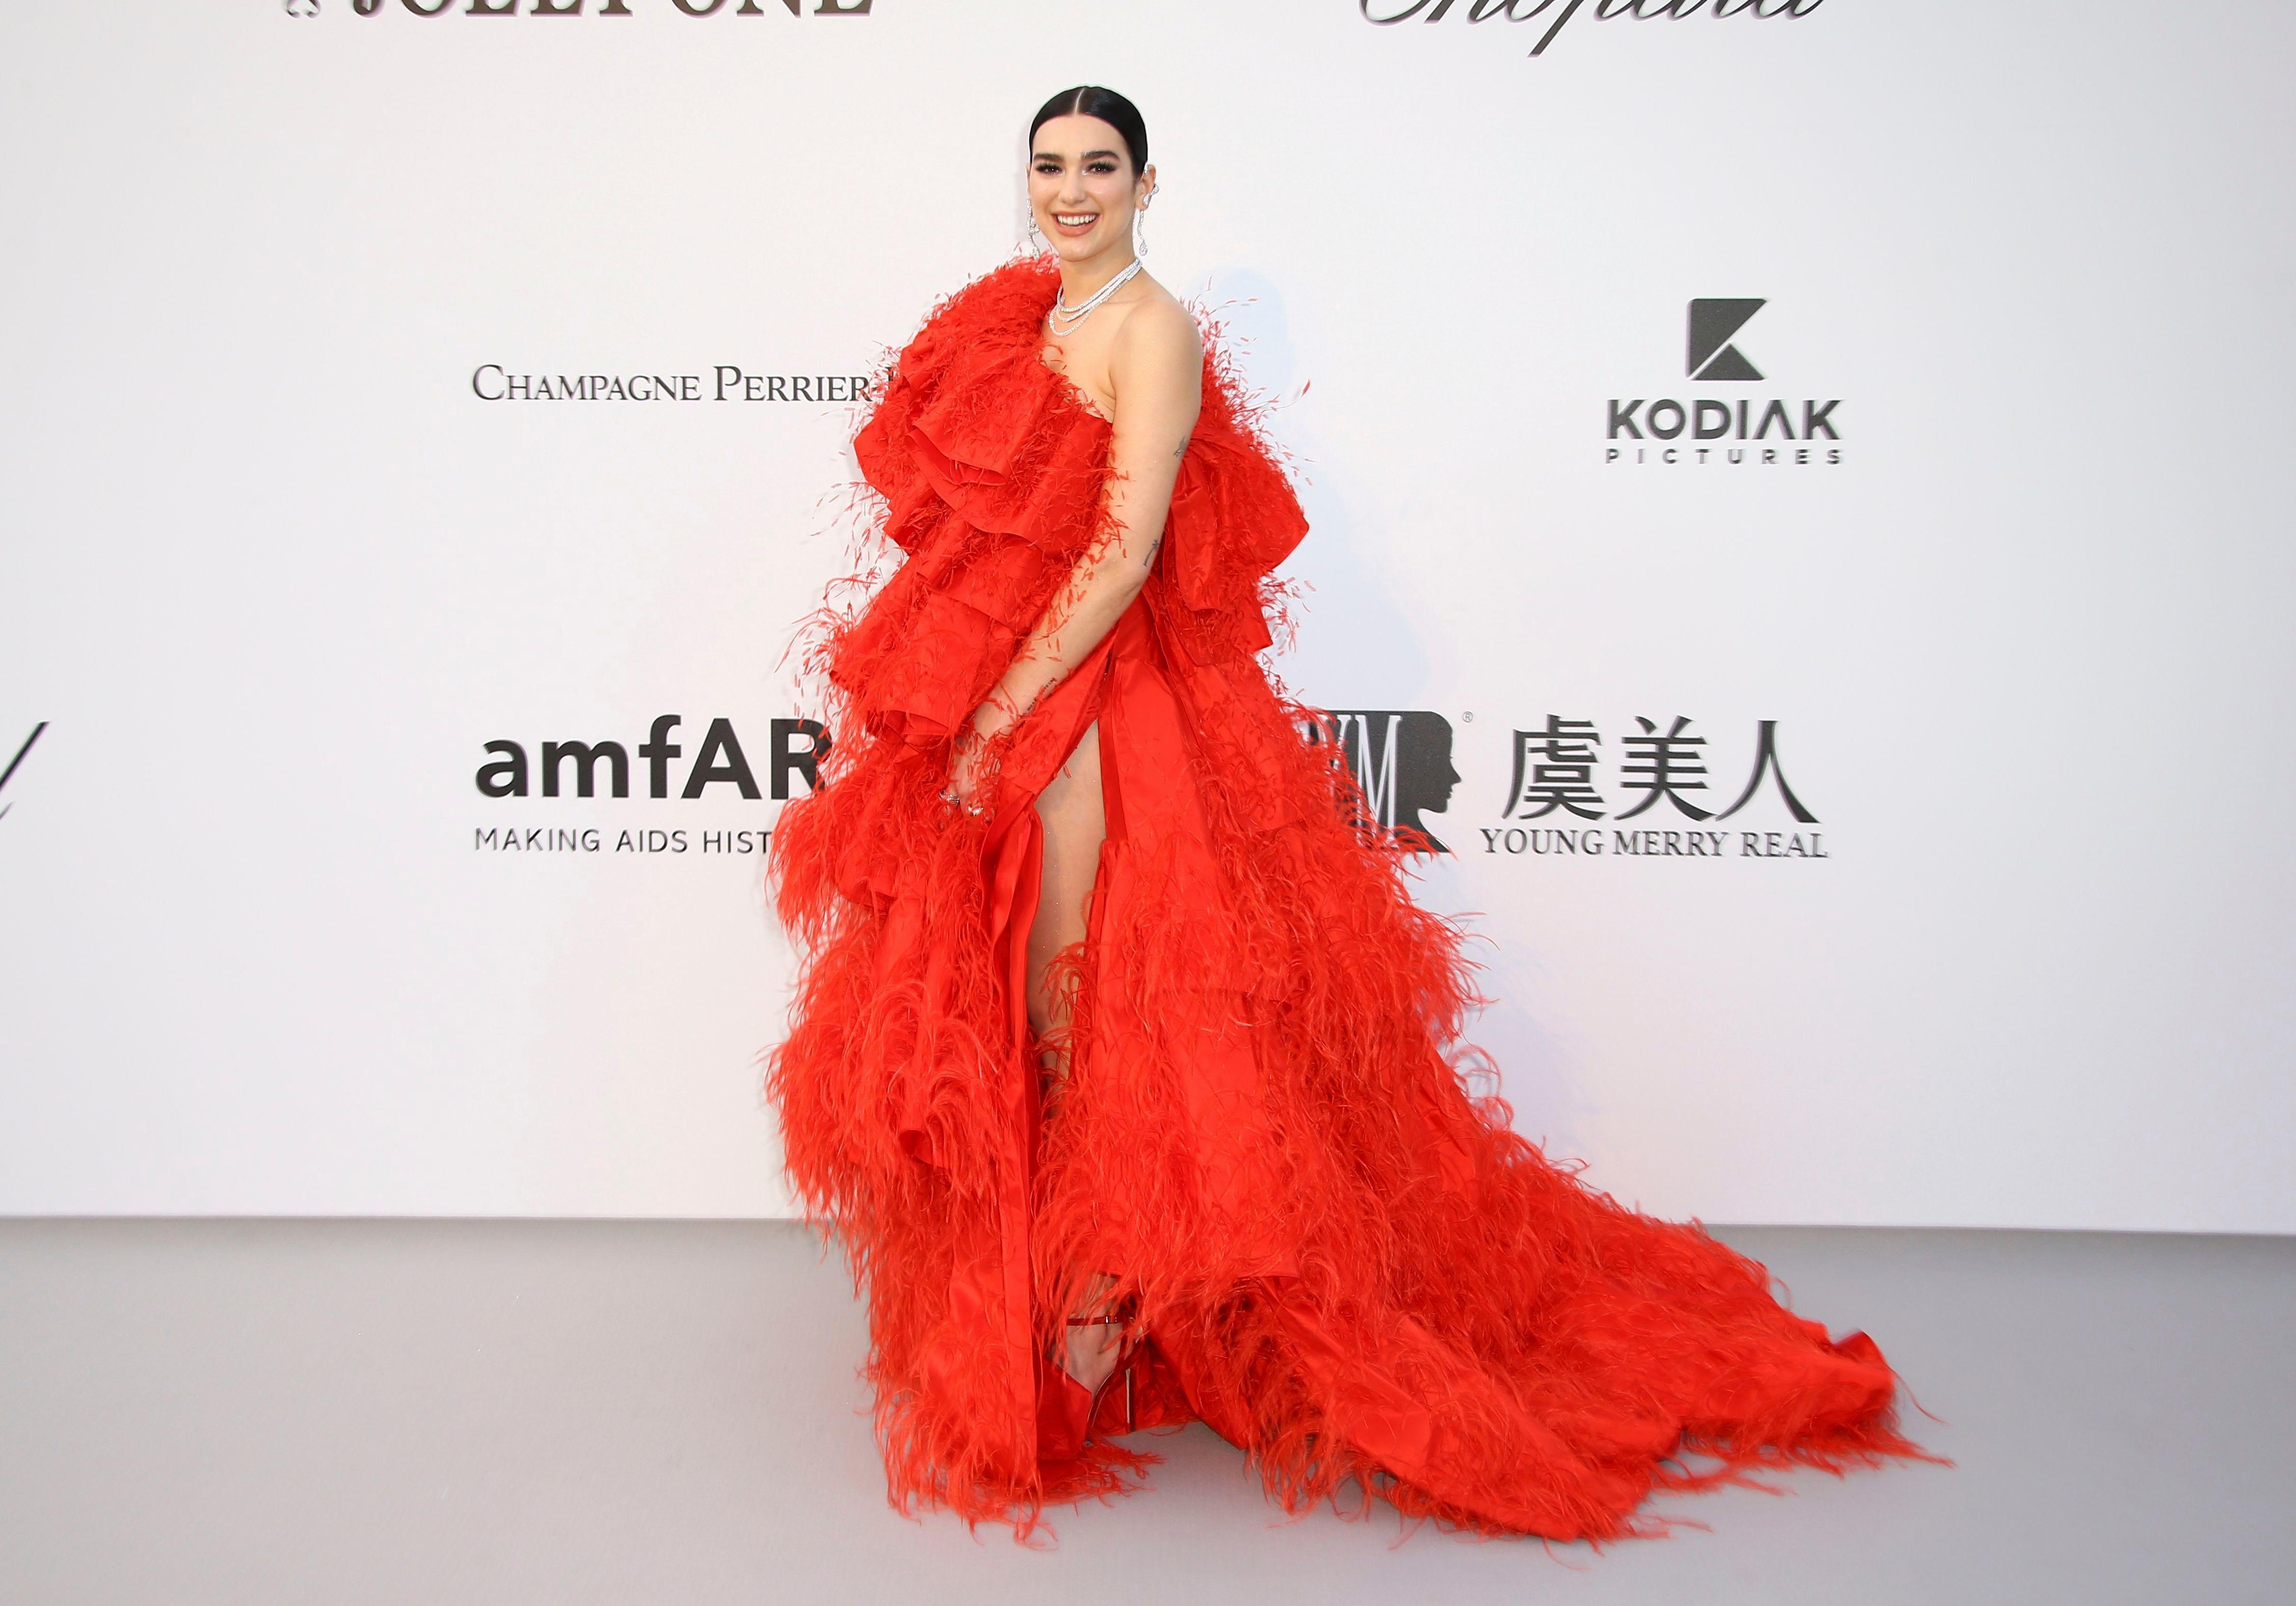 Dua Lipa Looks Ravishing in a Red Valentino Gown at the 2019 amfAR Gala